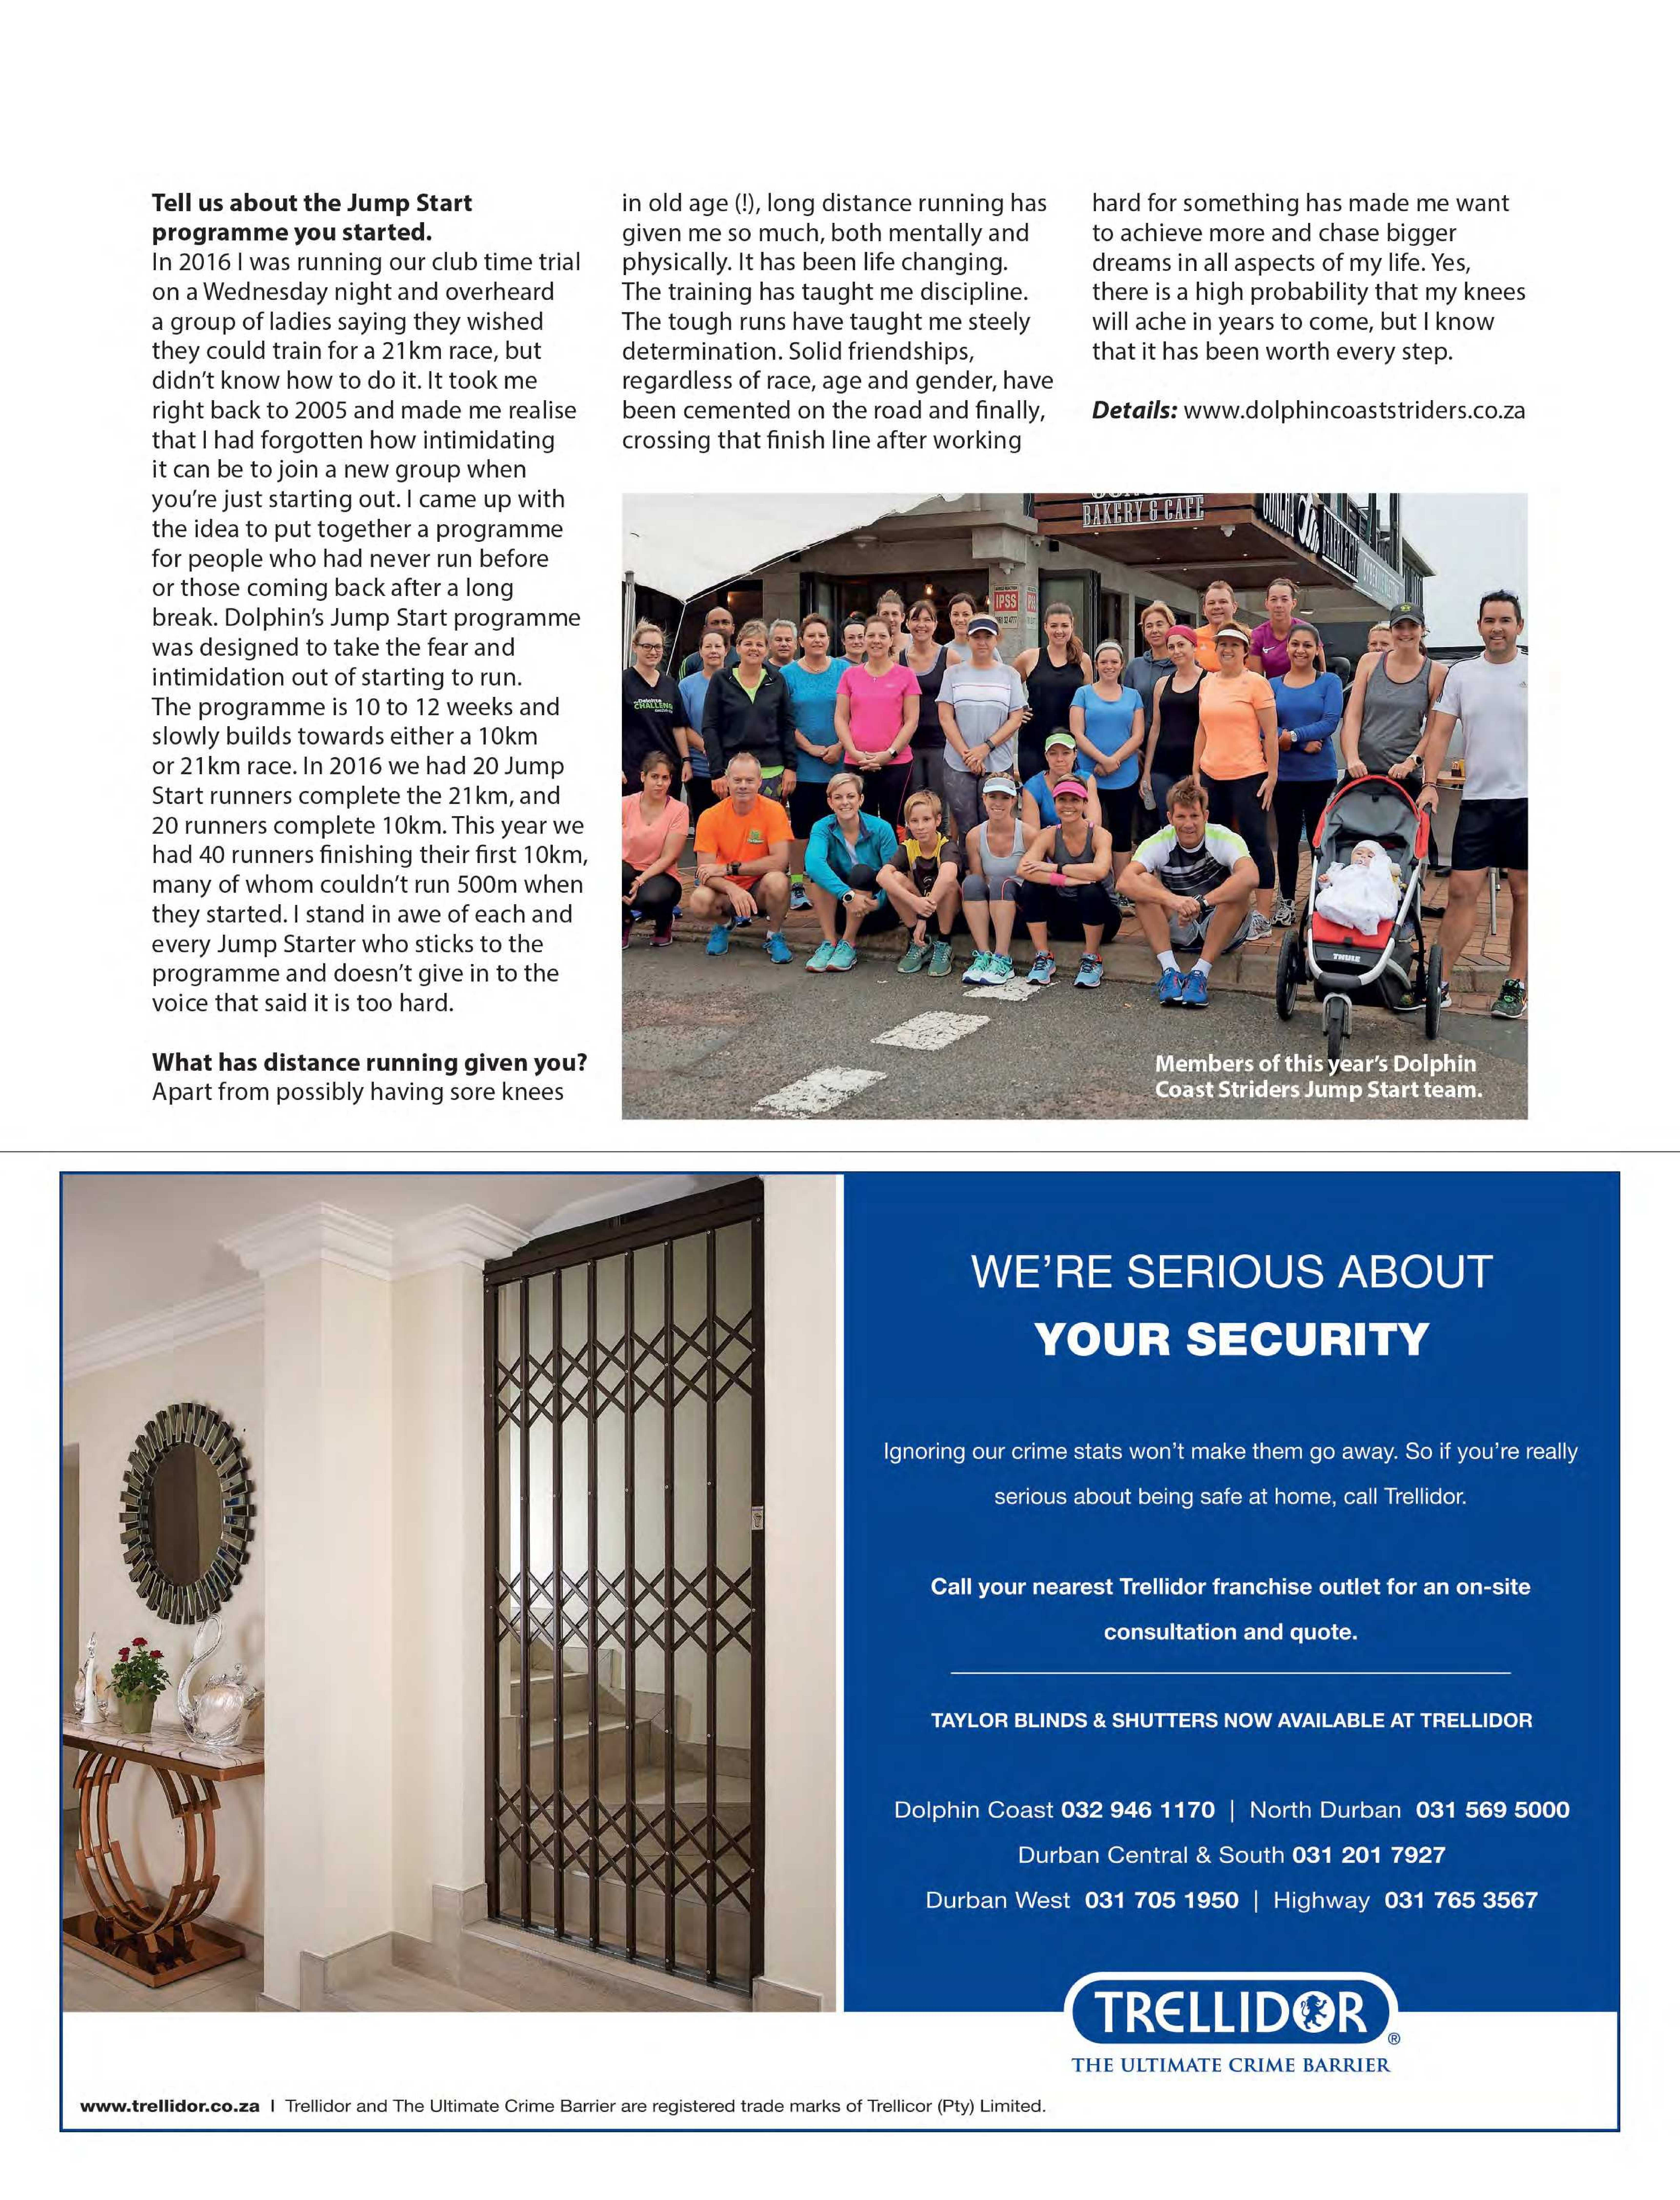 get-magazine-ballitoumhlanga-october-2018-epapers-page-31